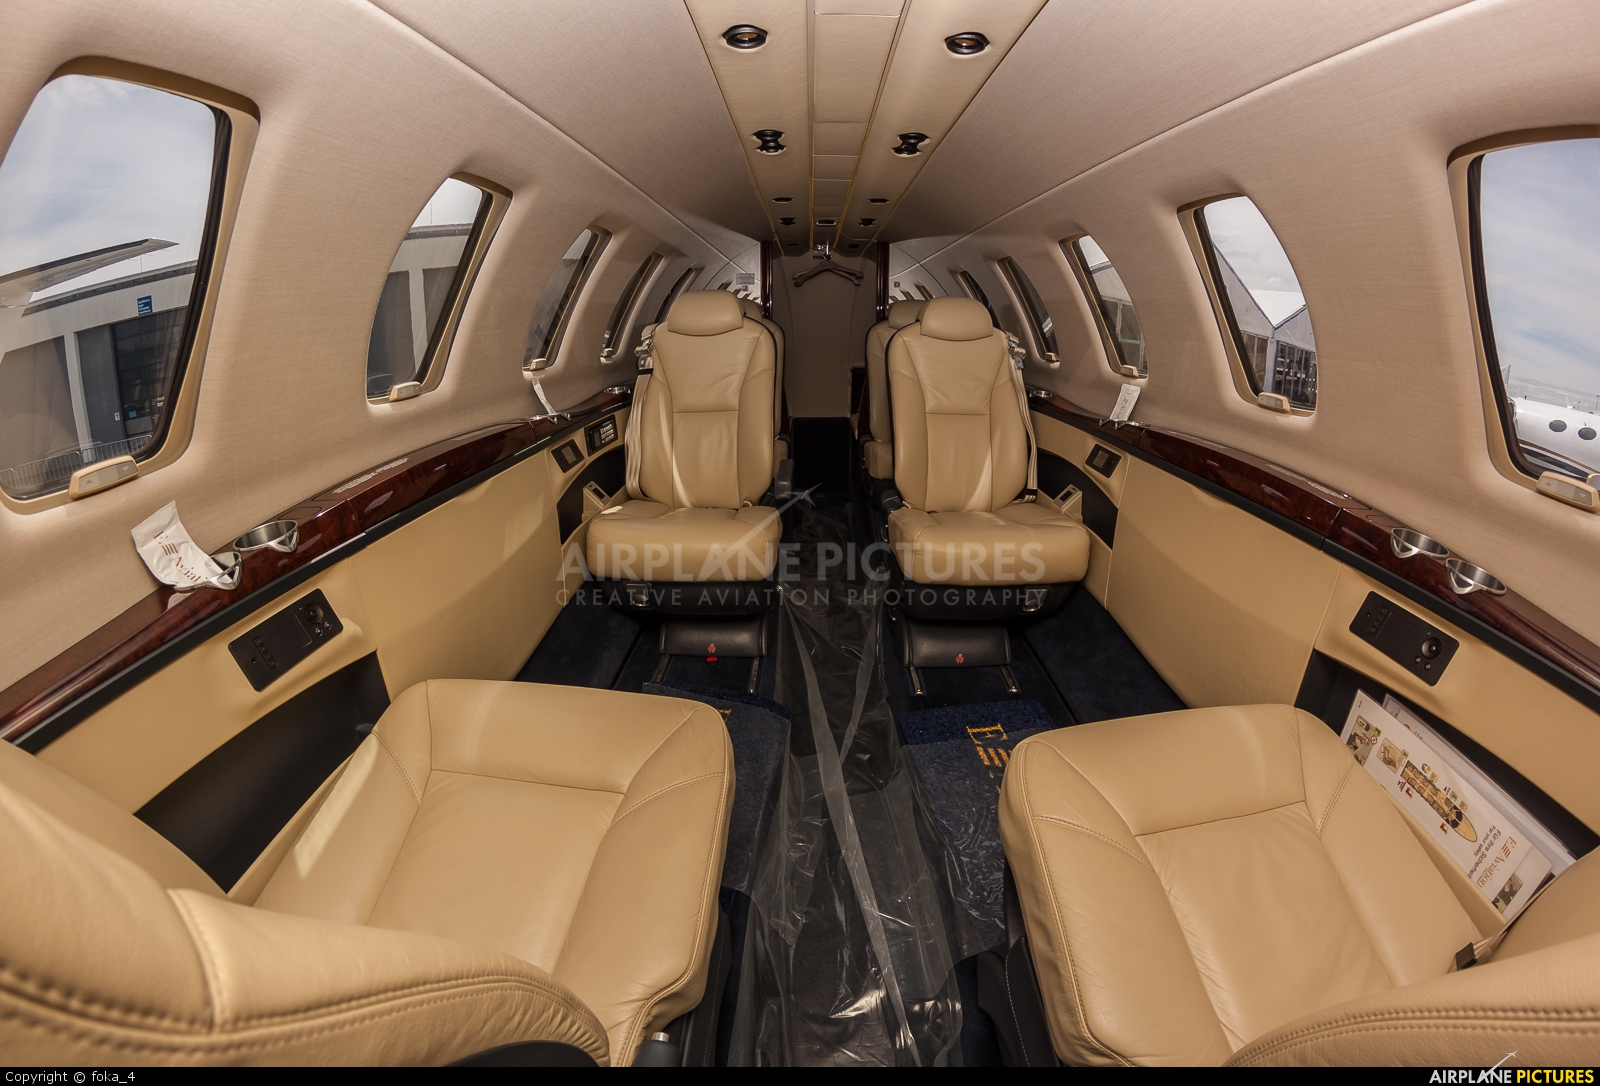 D Cefa Private Cessna 525c Citation Cj4 At Friedrichshafen